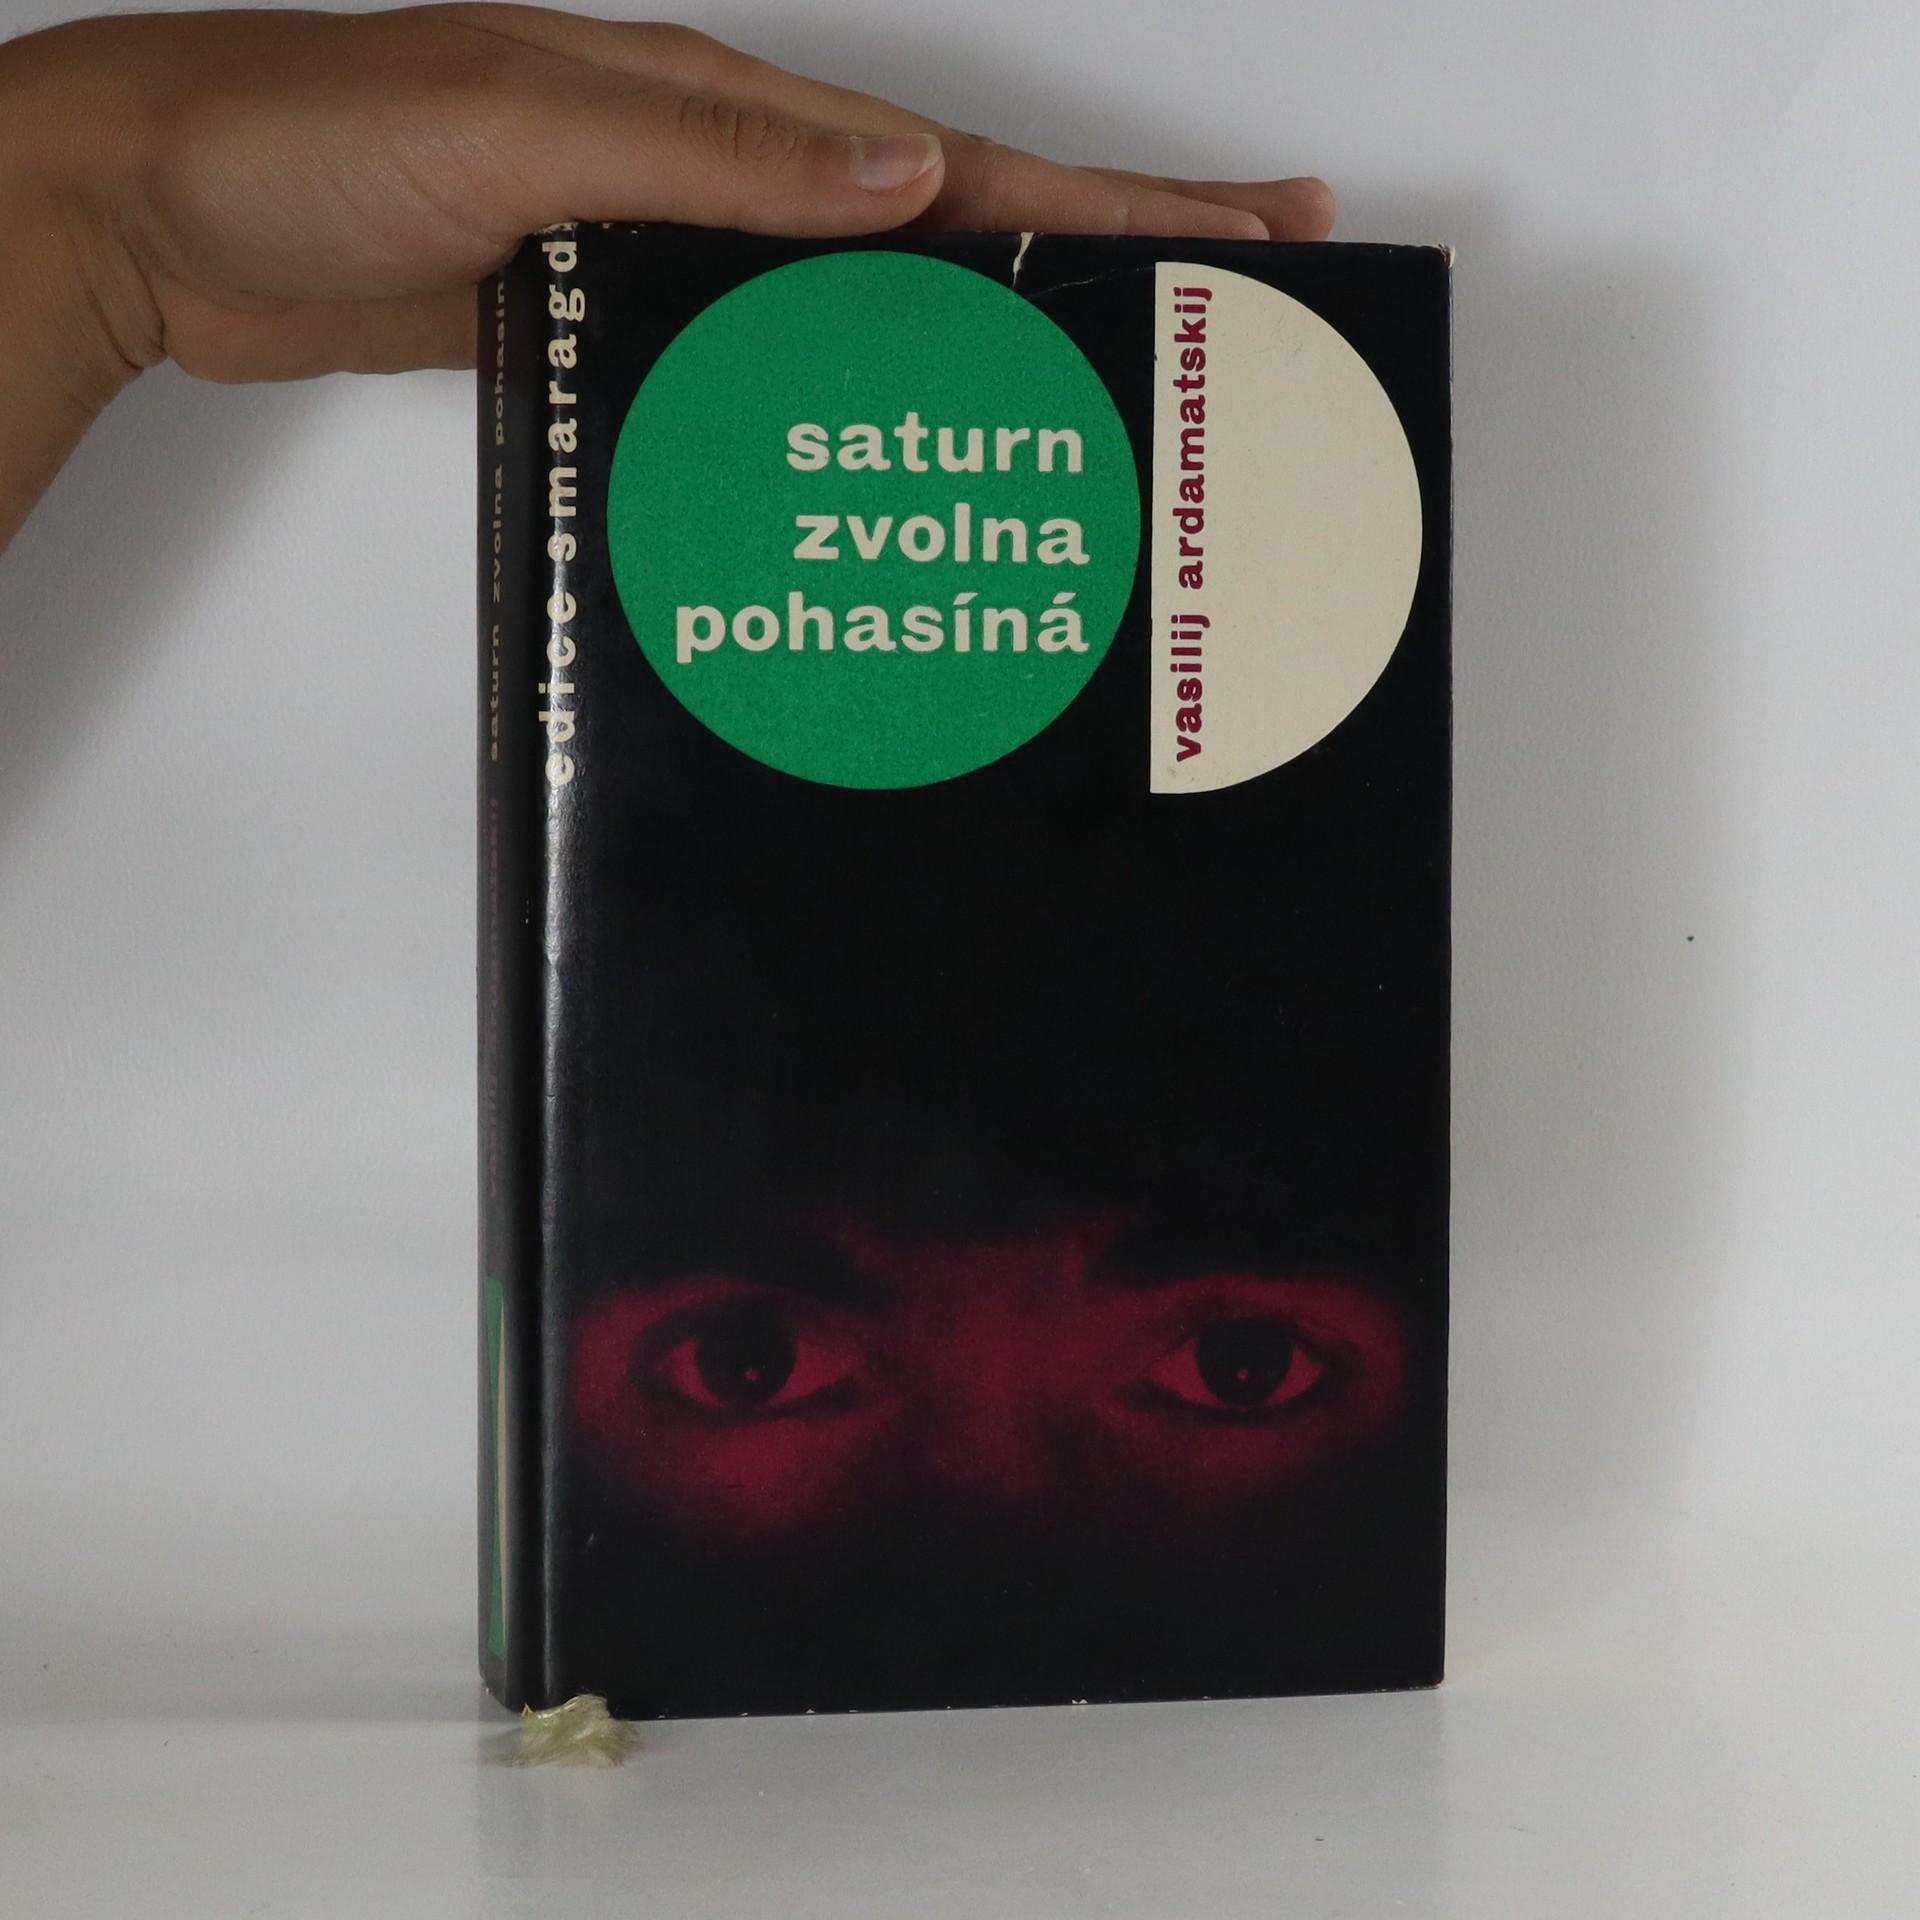 antikvární kniha Saturn zvolna pohasíná, 1965